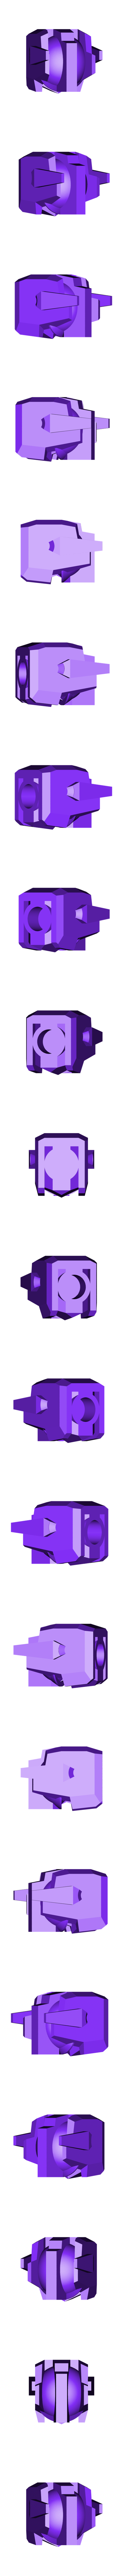 Head.STL Download STL file Low Poly Optimus Prime • Model to 3D print, biglildesign